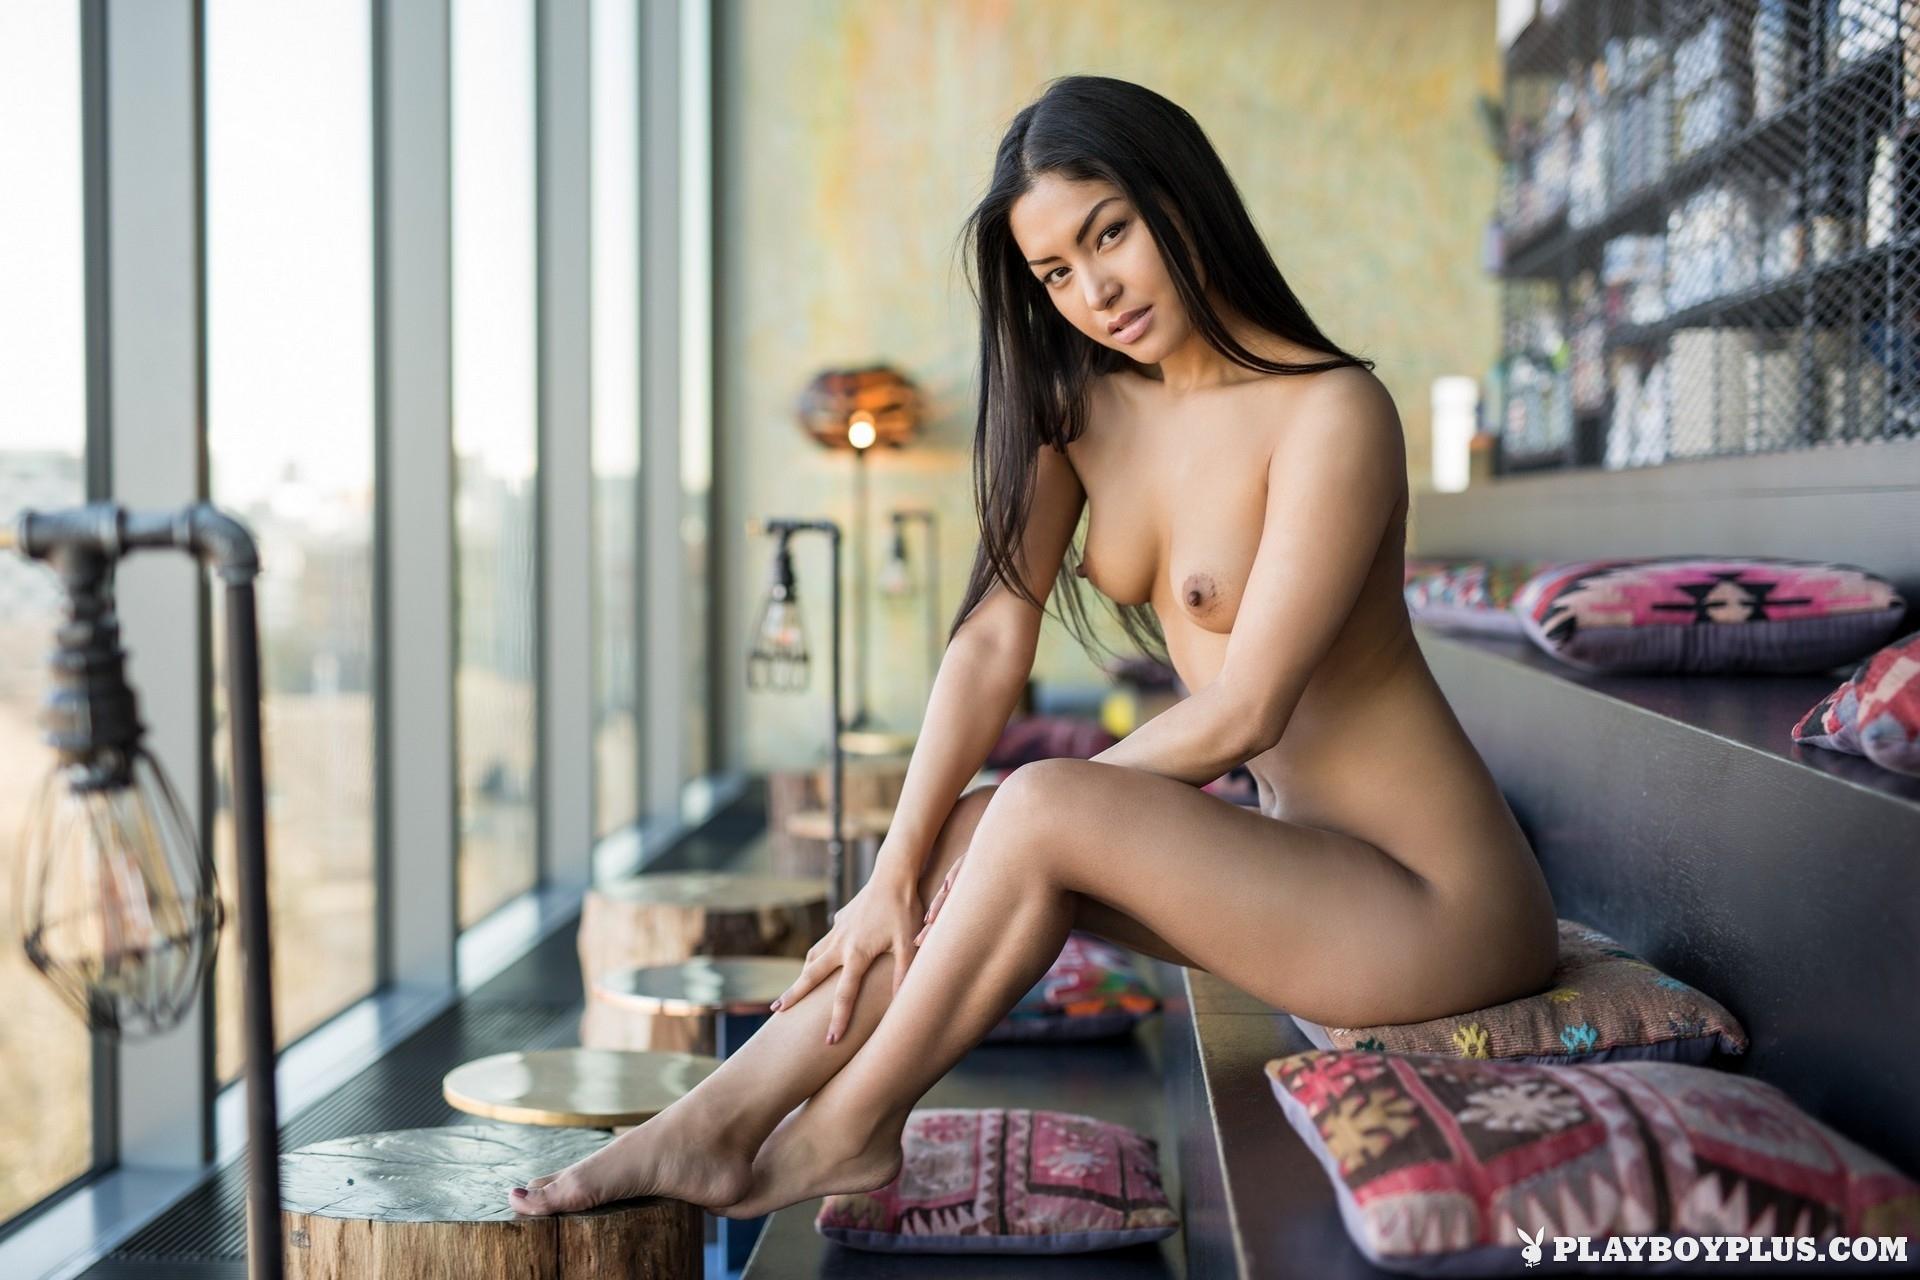 Playboy Plus Chloe Rose In Inspiring View (7)